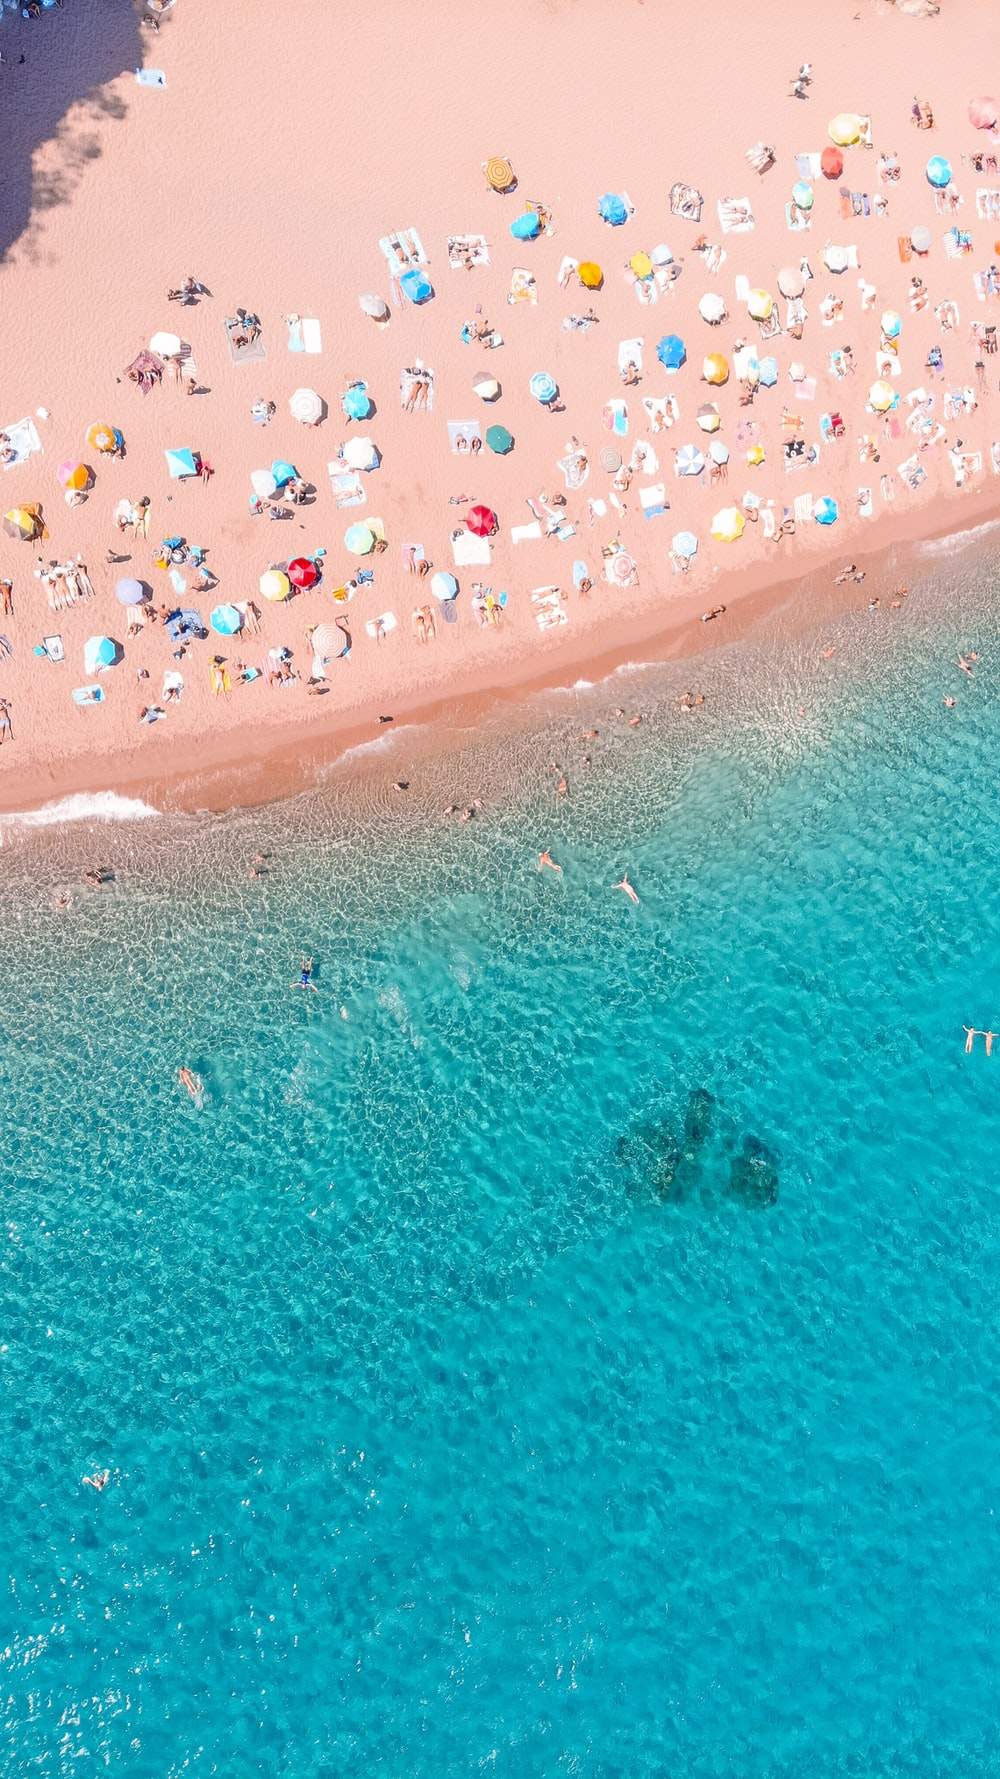 high-angle photography of seashore